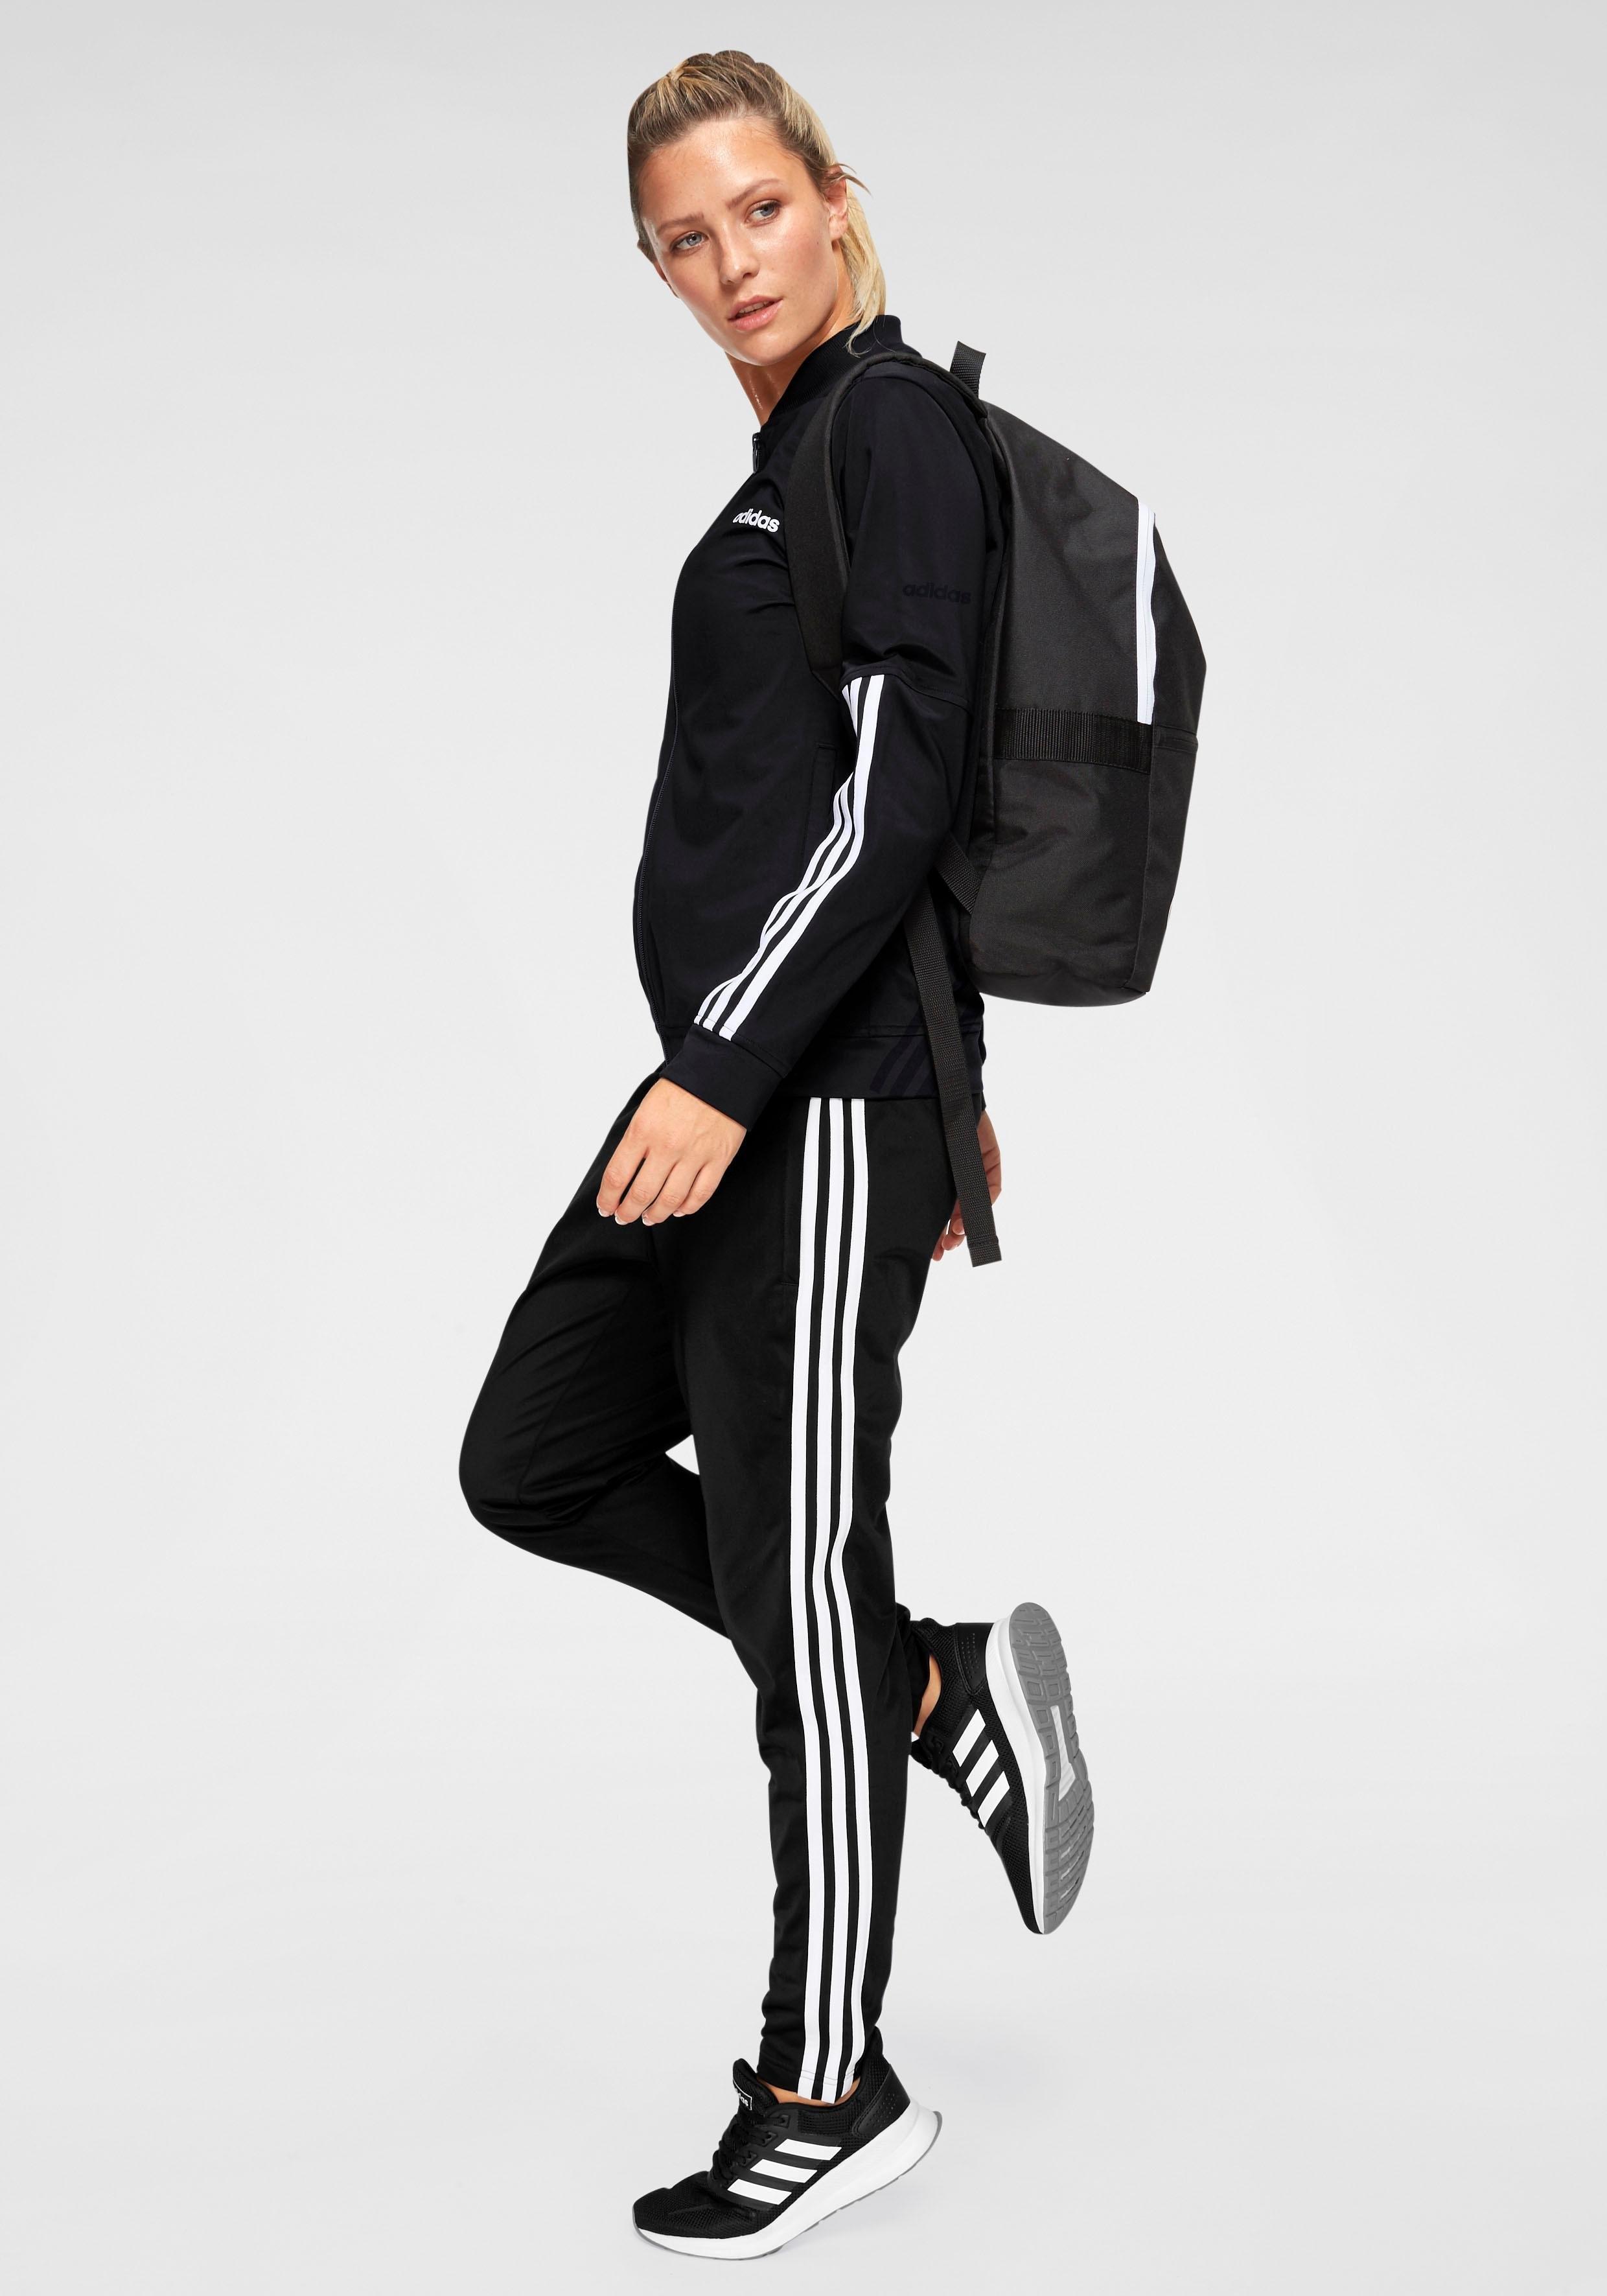 Je Adidas Bij Trainingspak Vind Trainingspak Adidas dthCsrQ